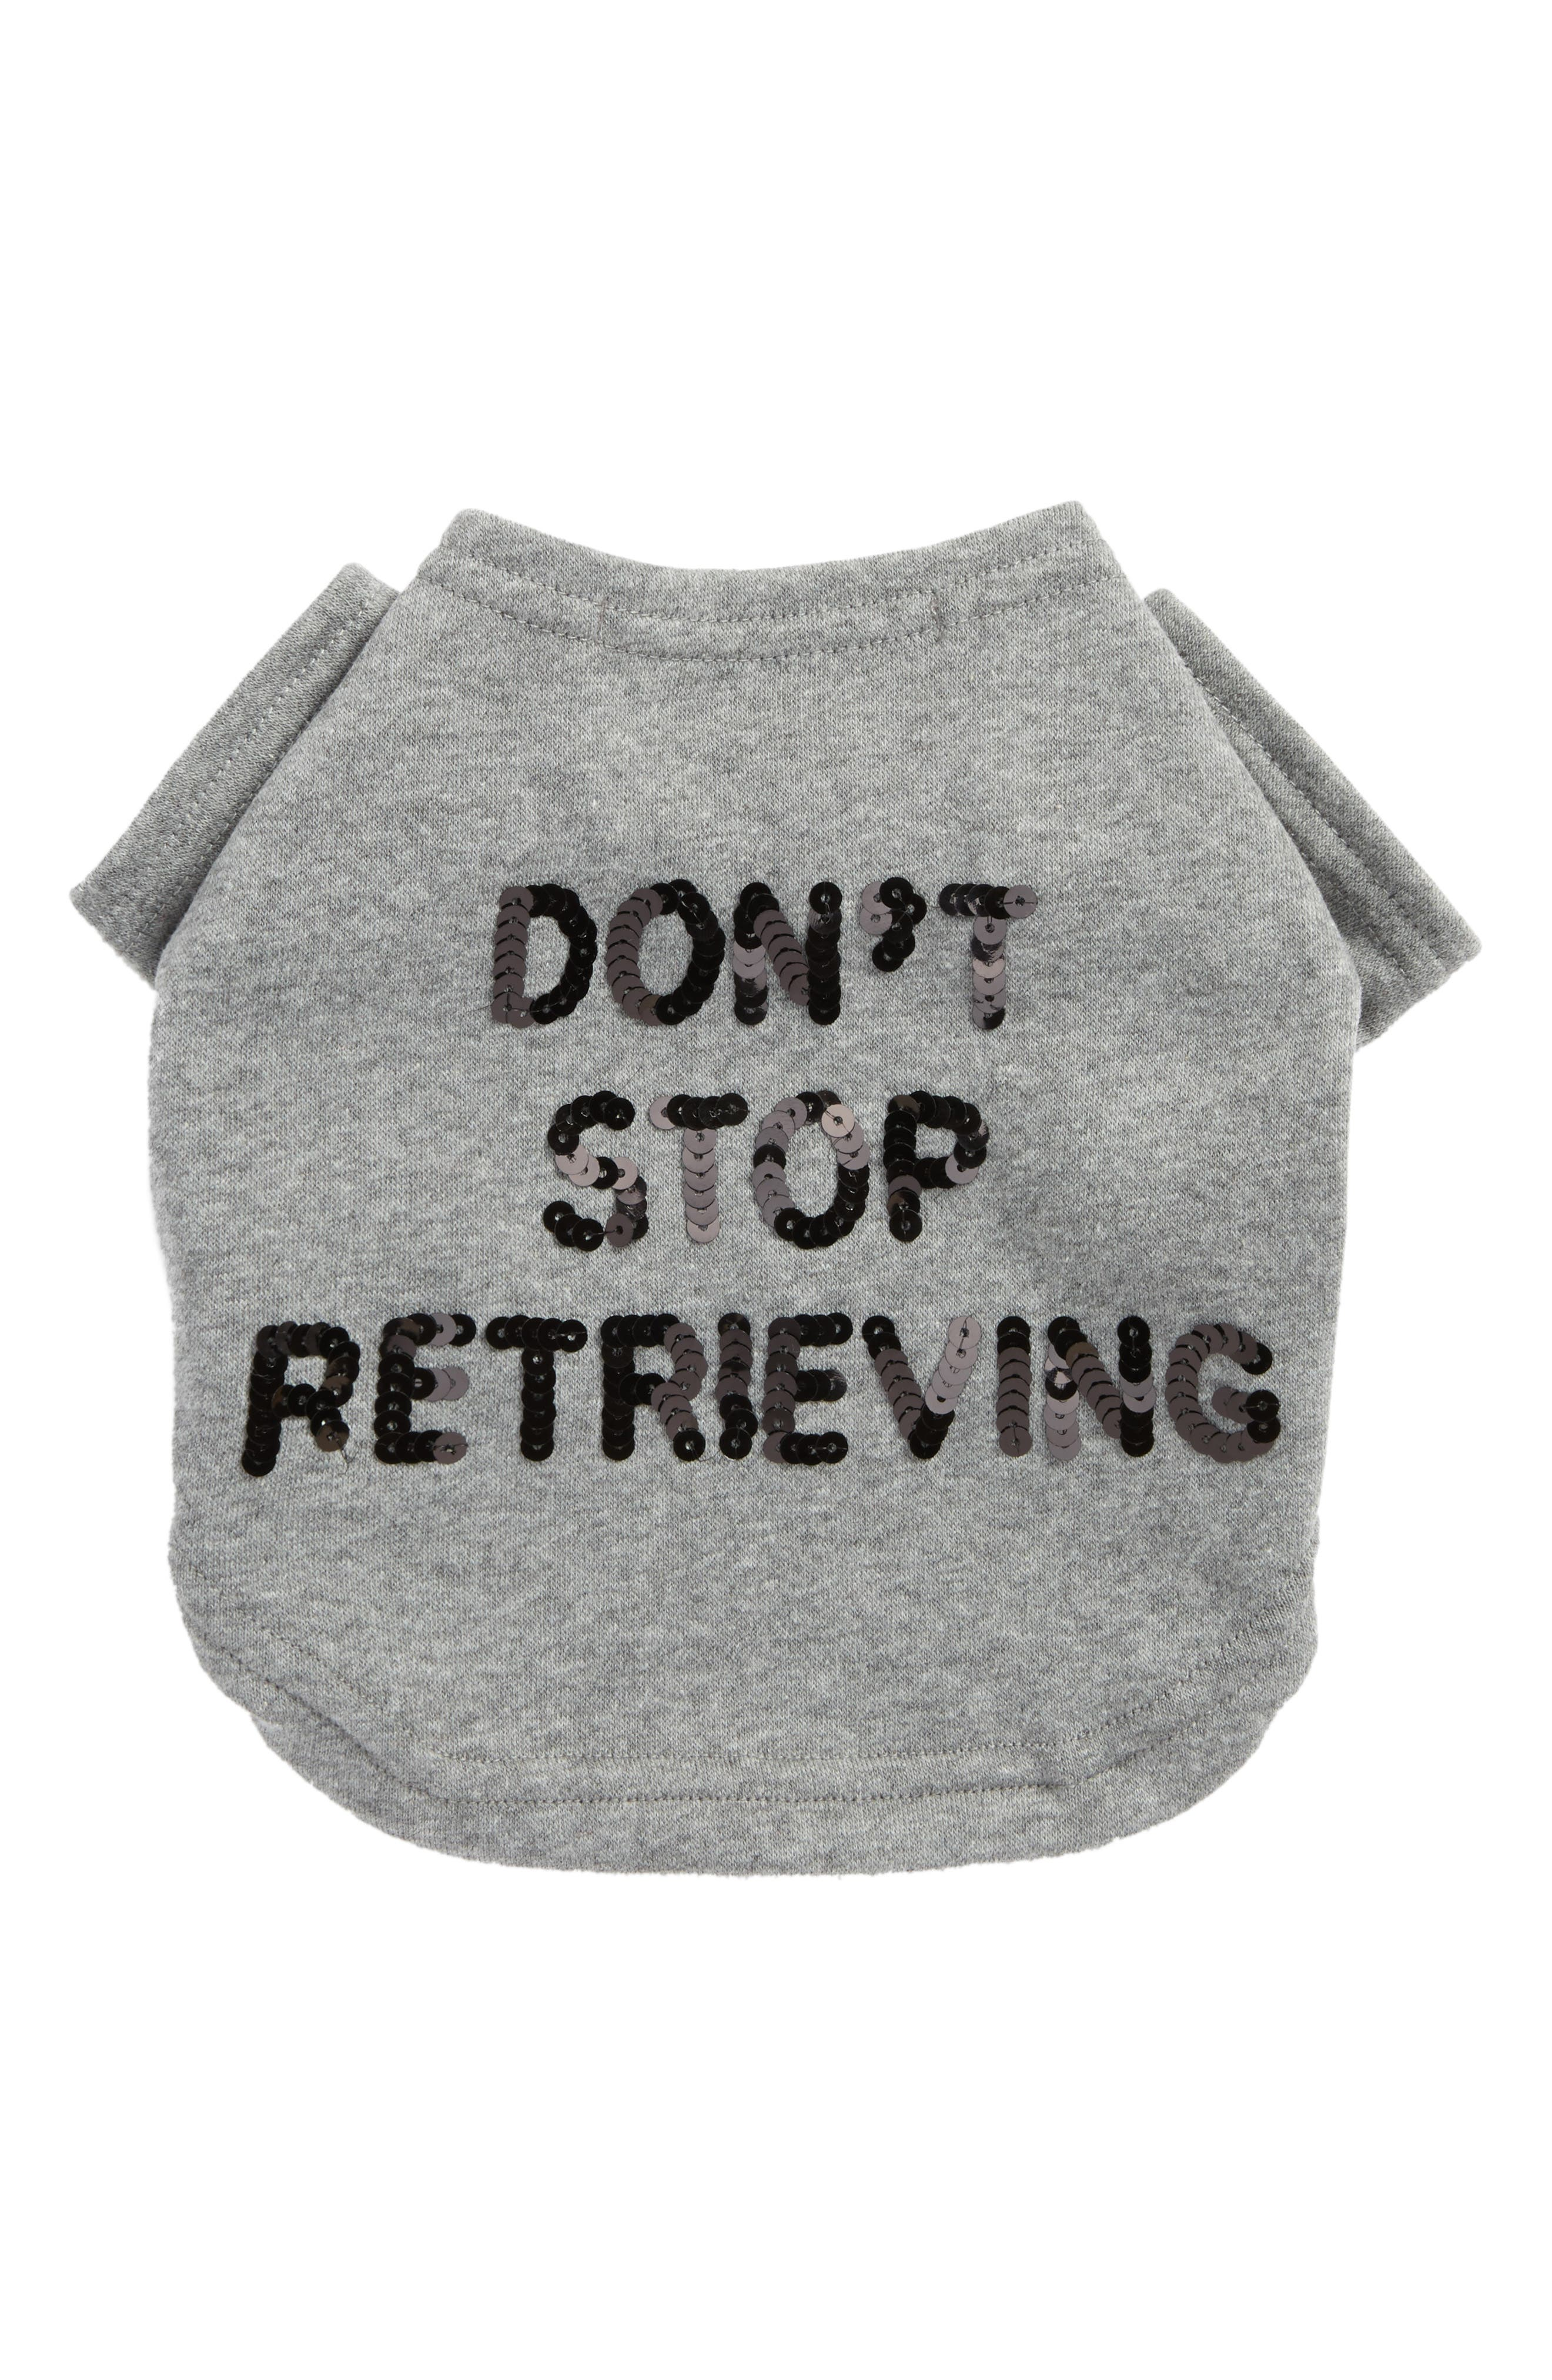 Alternate Image 1 Selected - Bow & Drape Don't Stop Retrieving Pet Sweatshirt